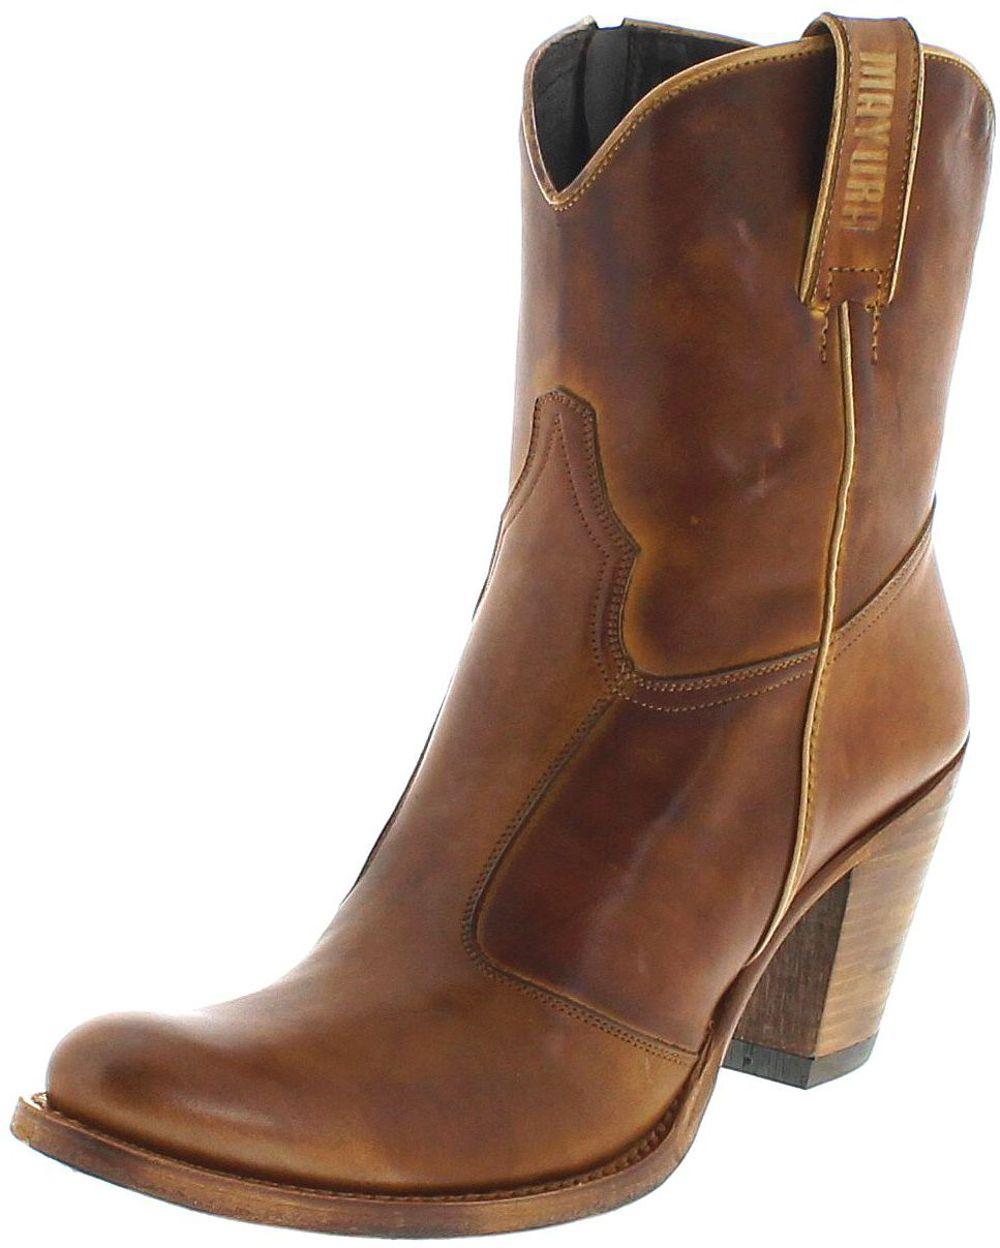 Mayura Boots MB028 Lavado Cuero Fashion ankle boot - Brown